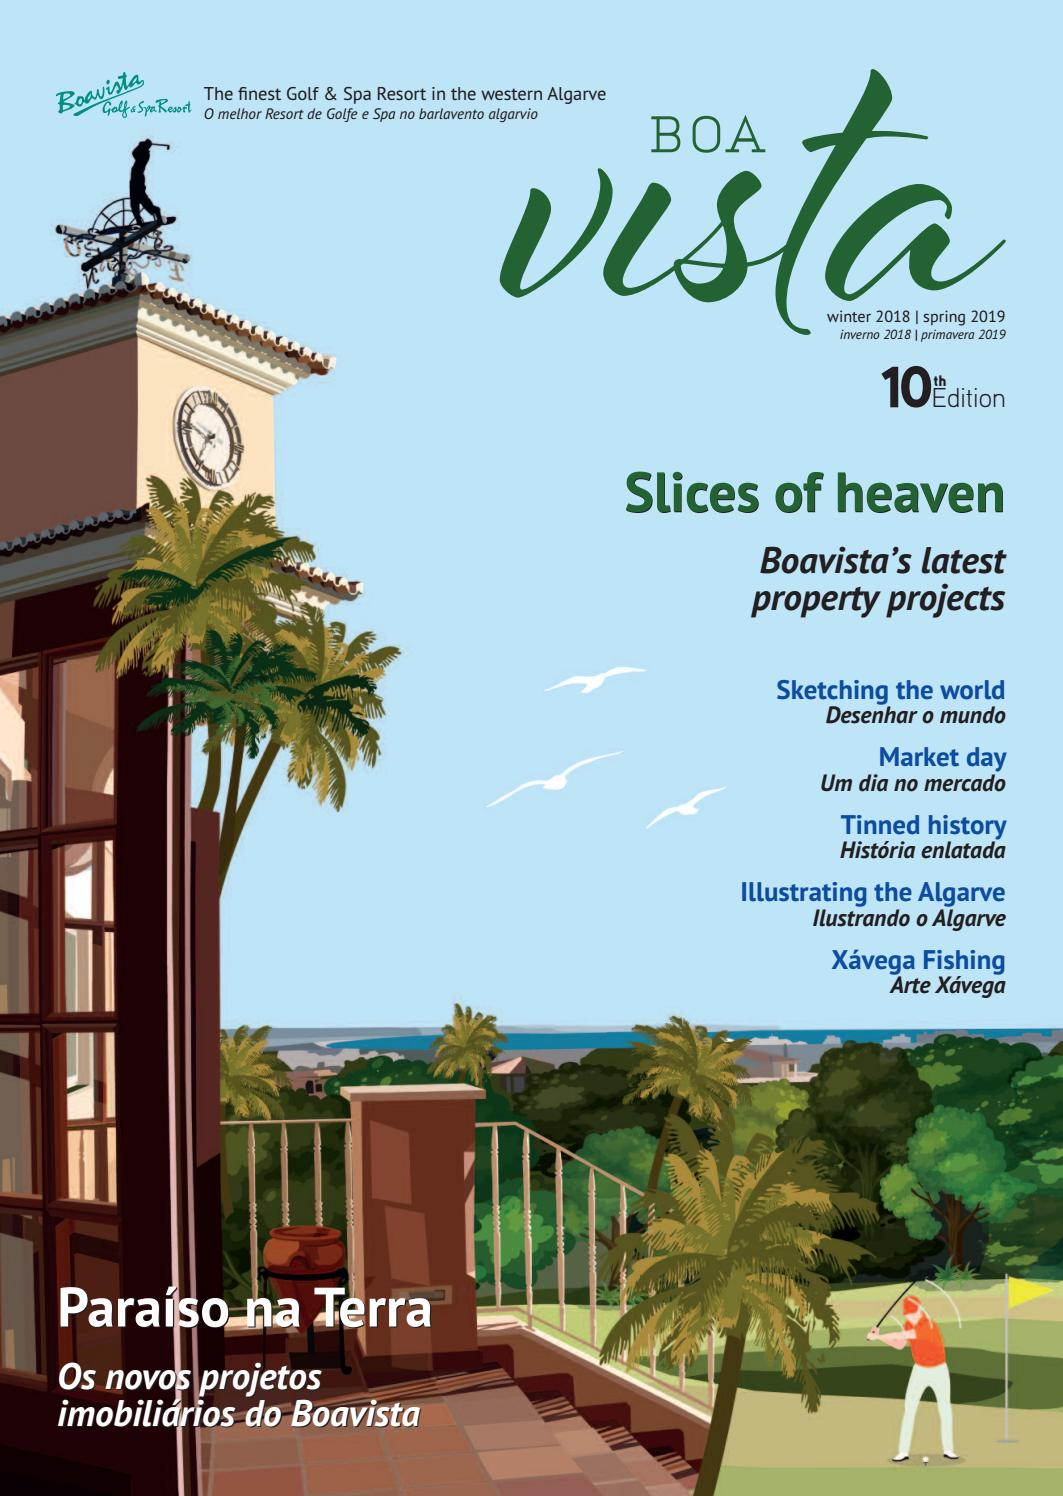 Boa vista 10 by boavista golf spa resort issuu